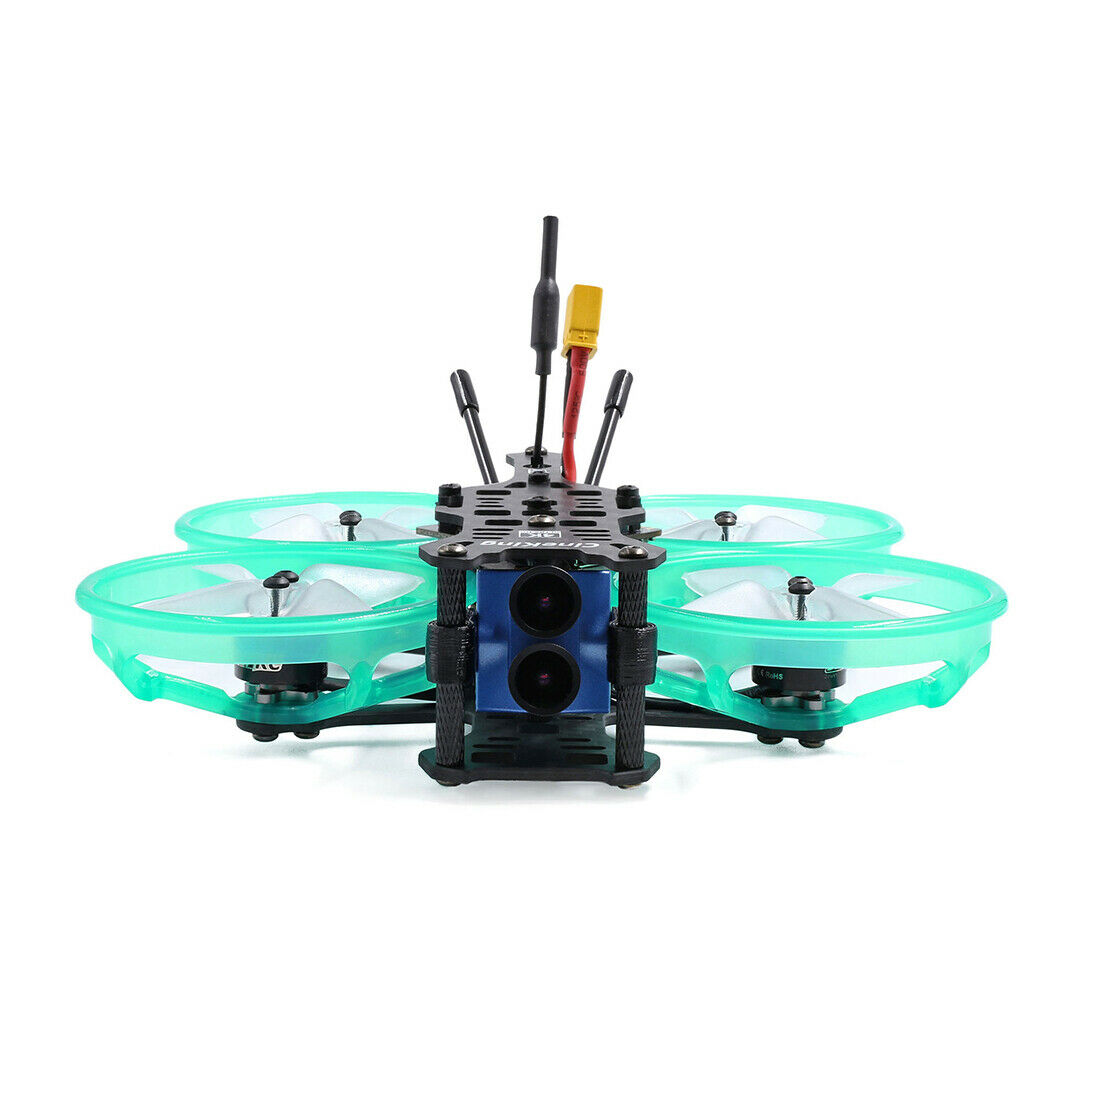 GEPRC Cineking 4K 2-4S FPV Racing Drone PNP BNF with FPV Camera Brushless Motor